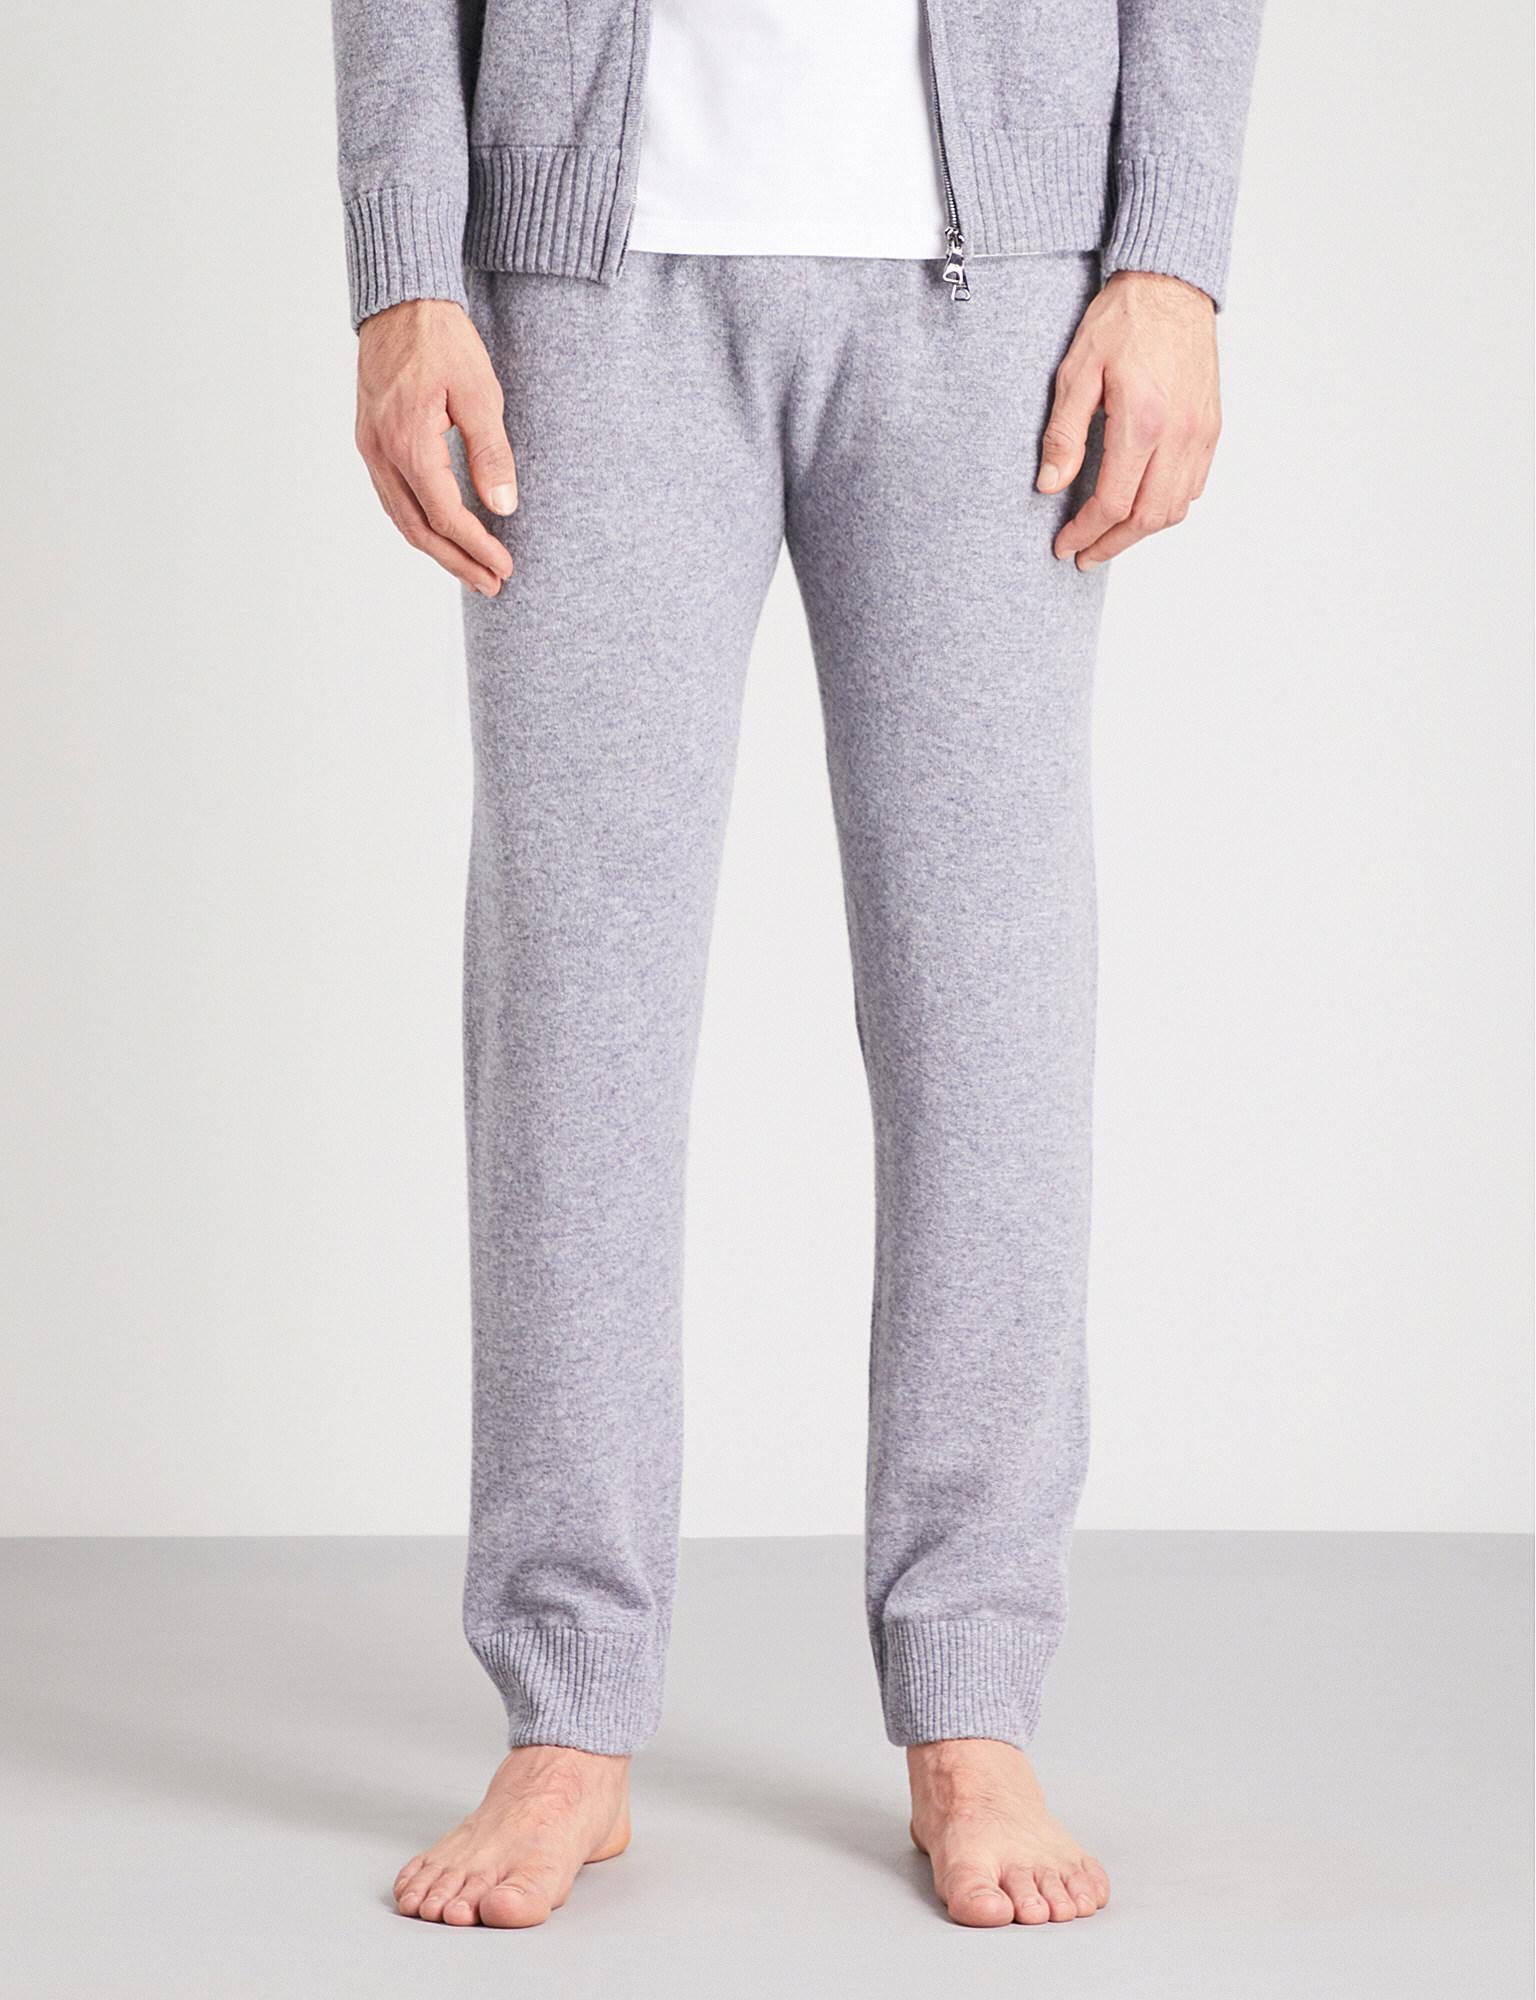 2fc7aff47d2f Lyst - Derek Rose Finley Cashmere Pyjama Bottoms in Metallic for Men